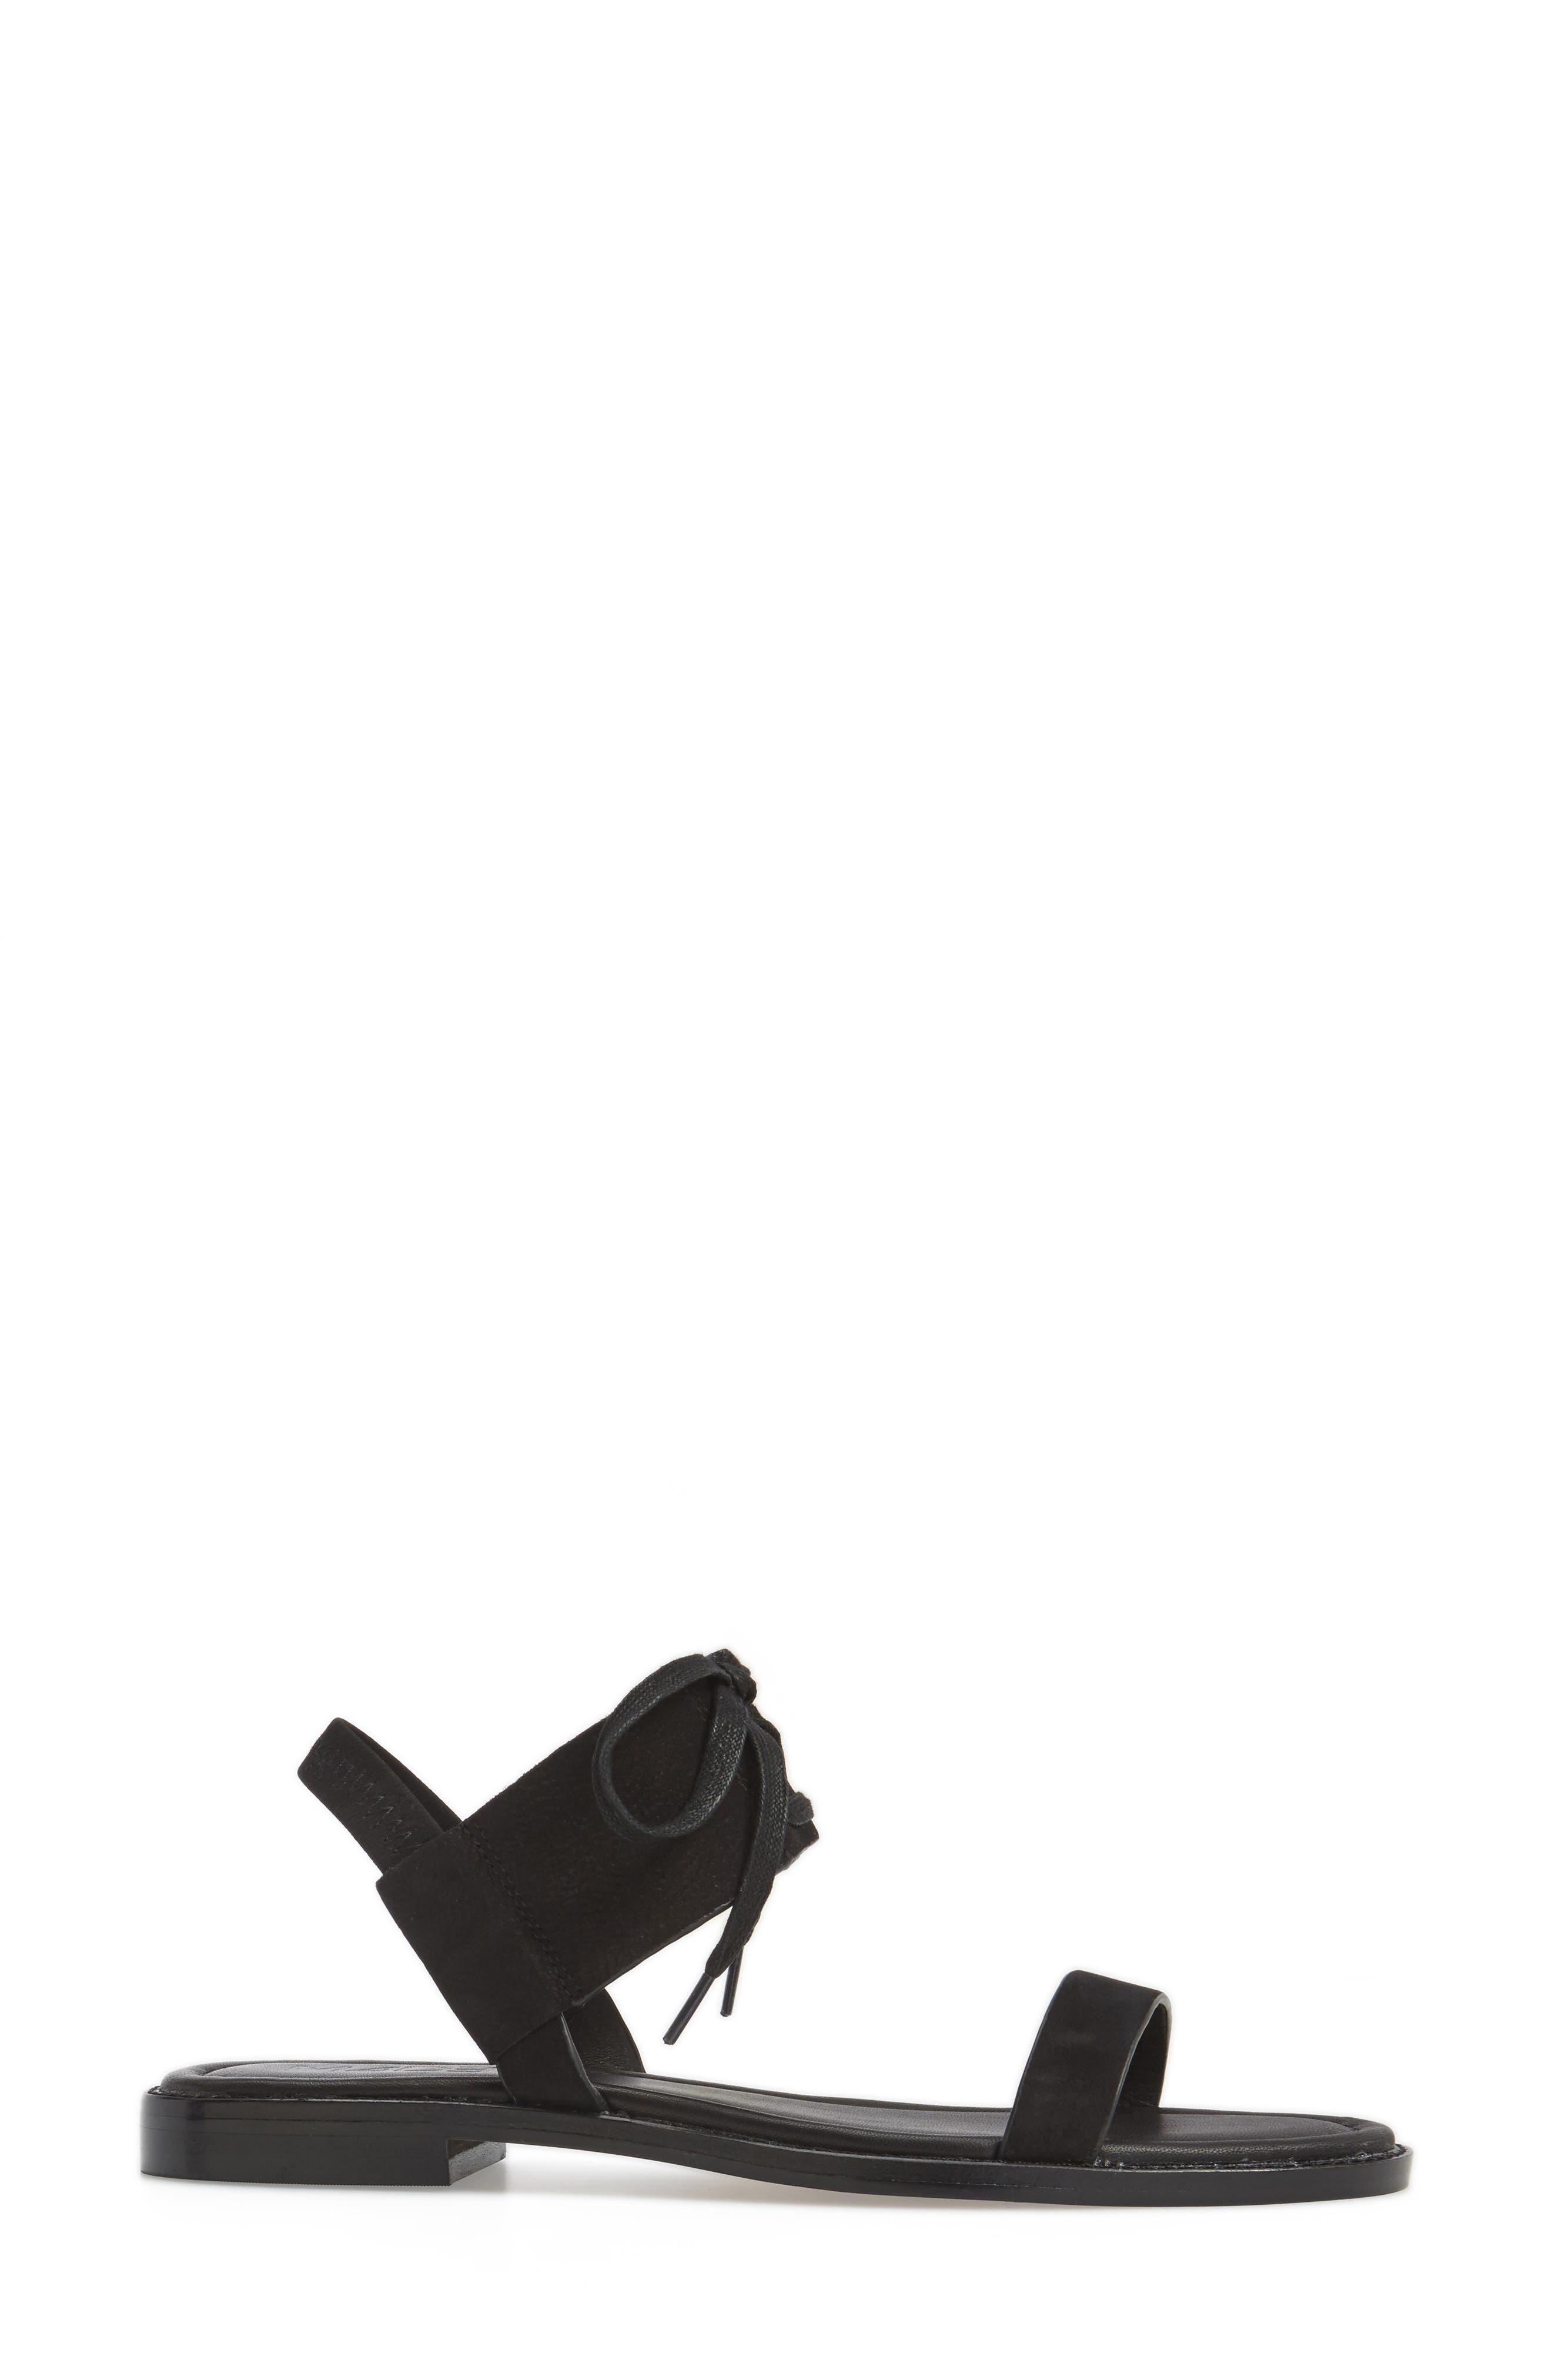 M4D3 Hailey Slingback Sandal,                             Alternate thumbnail 3, color,                             001